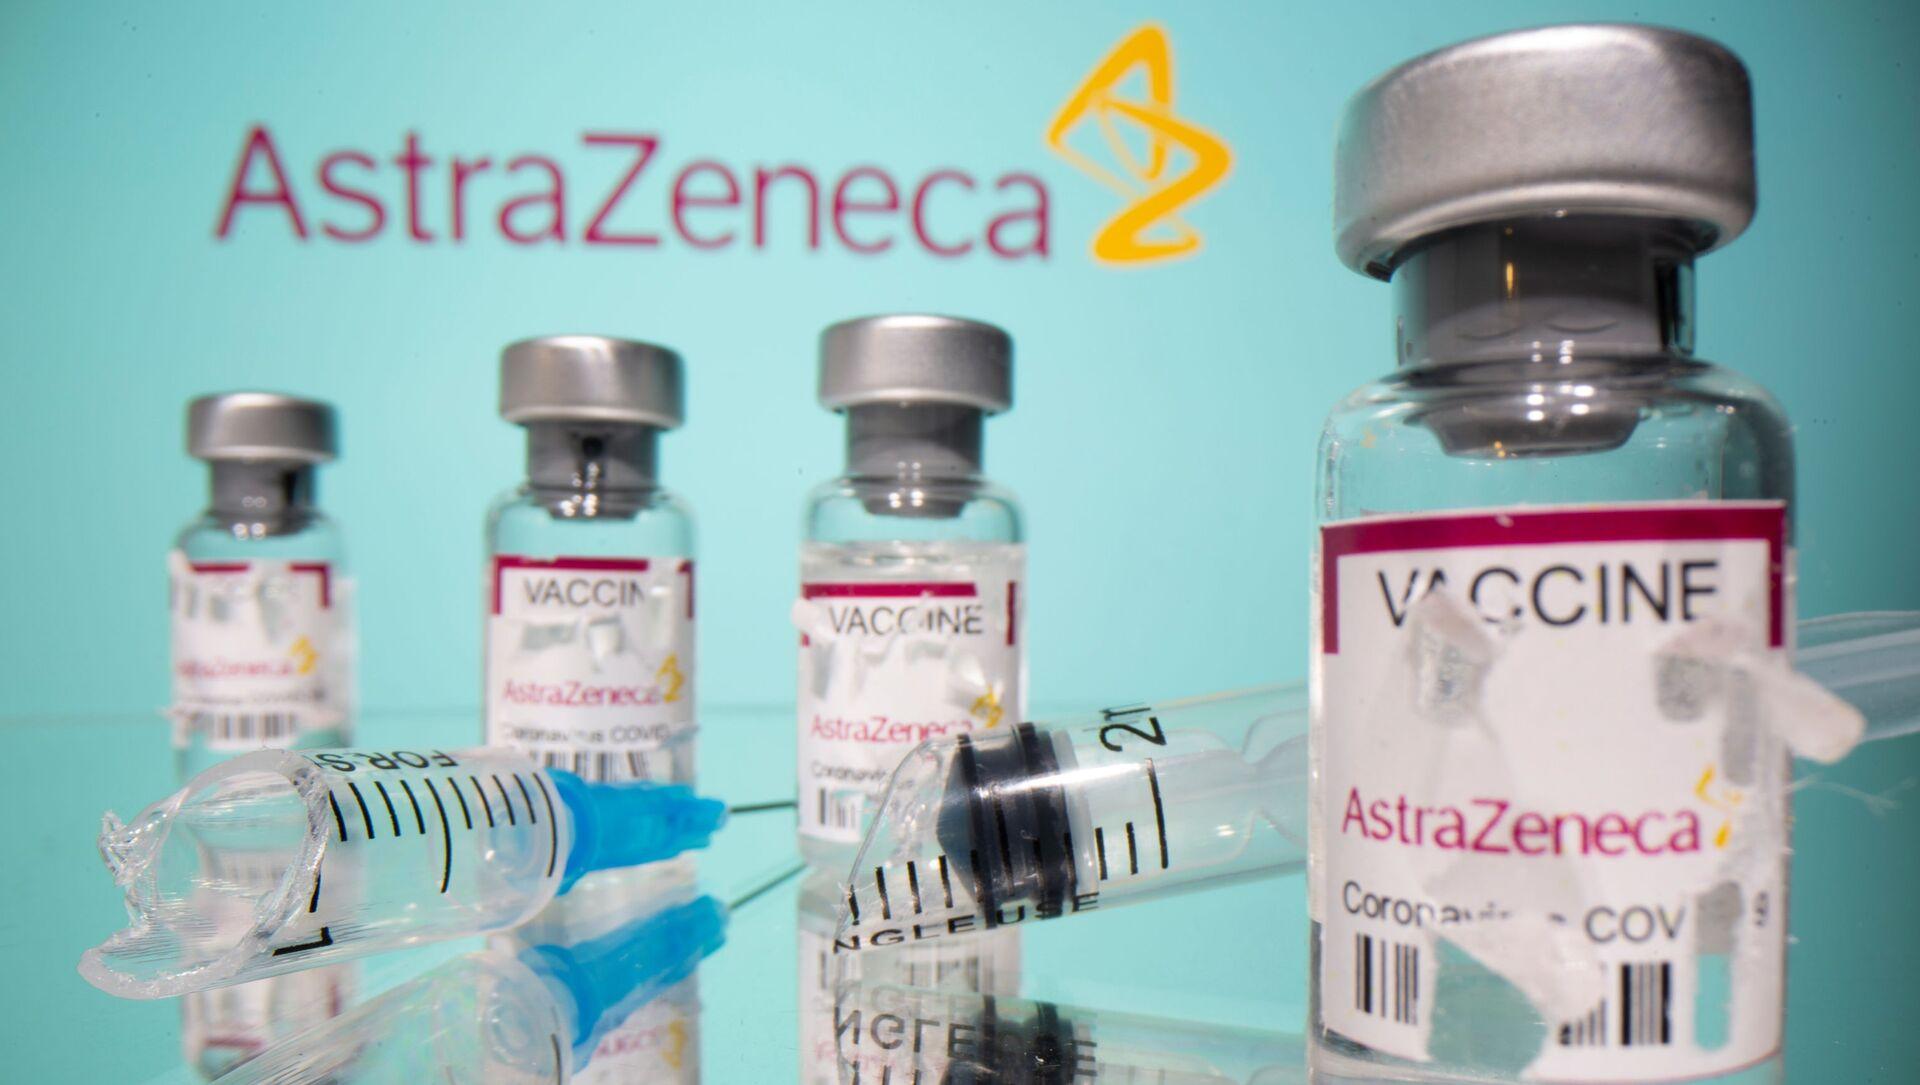 Vaccin AstraZeneca - Sputnik France, 1920, 28.07.2021